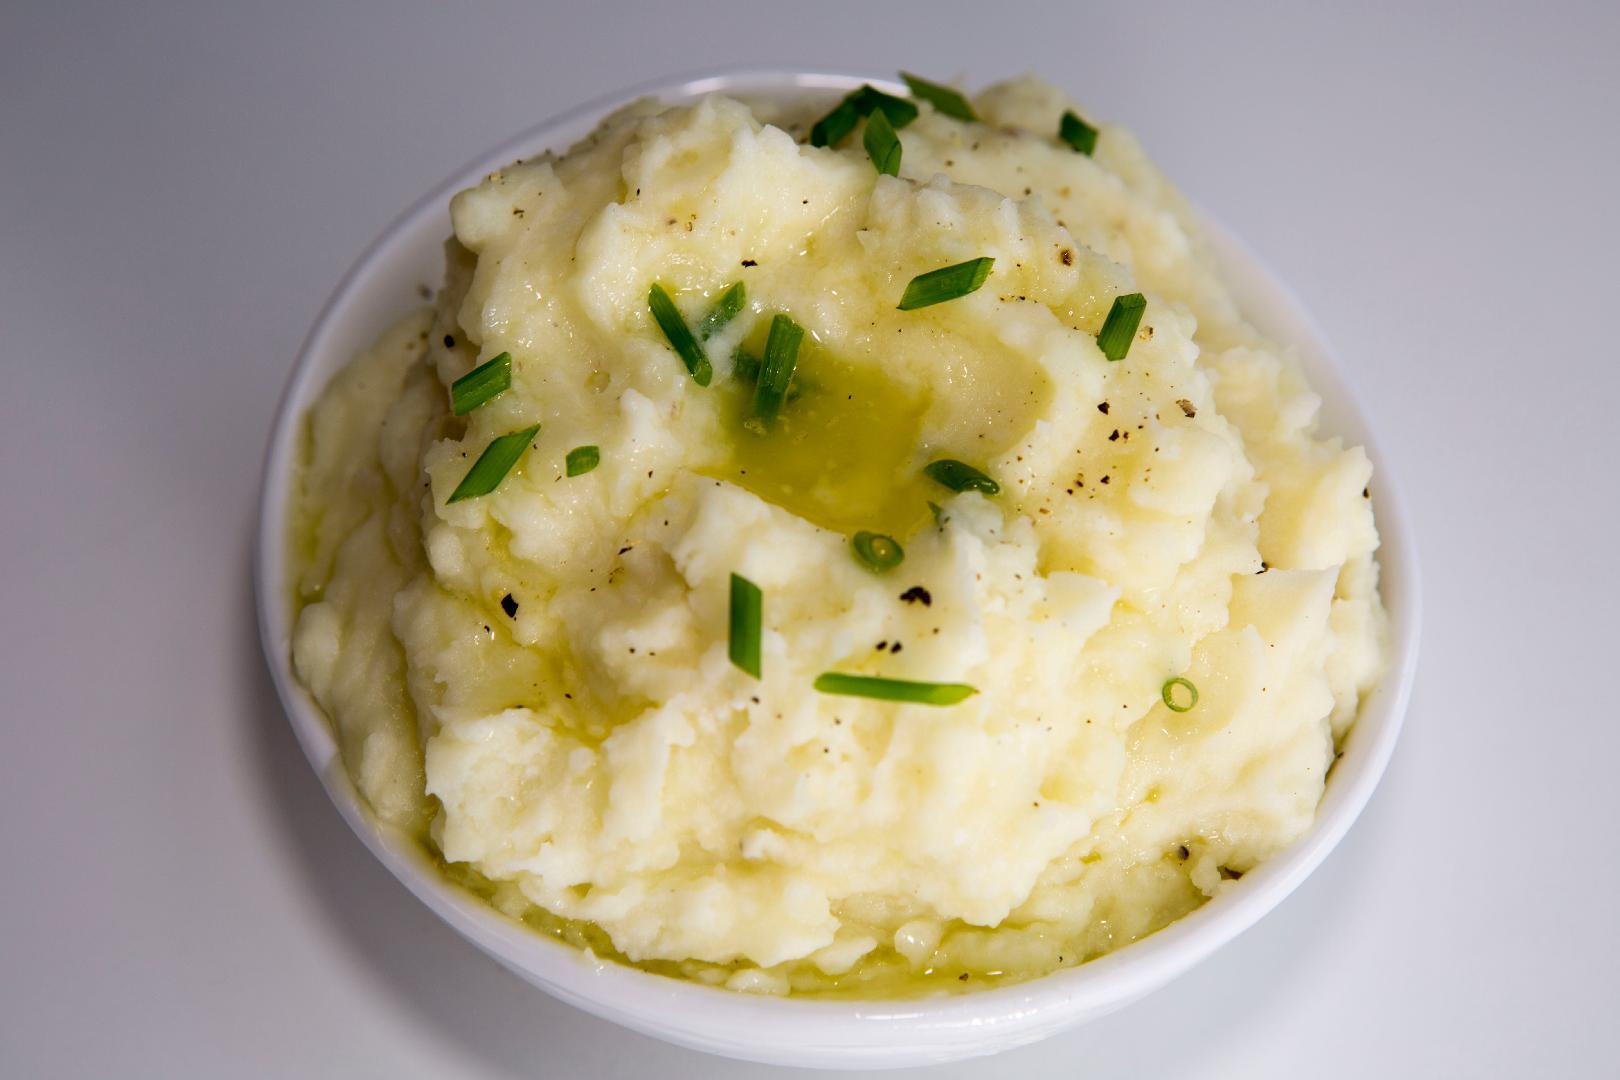 Streaming potatoes instant pot recipes